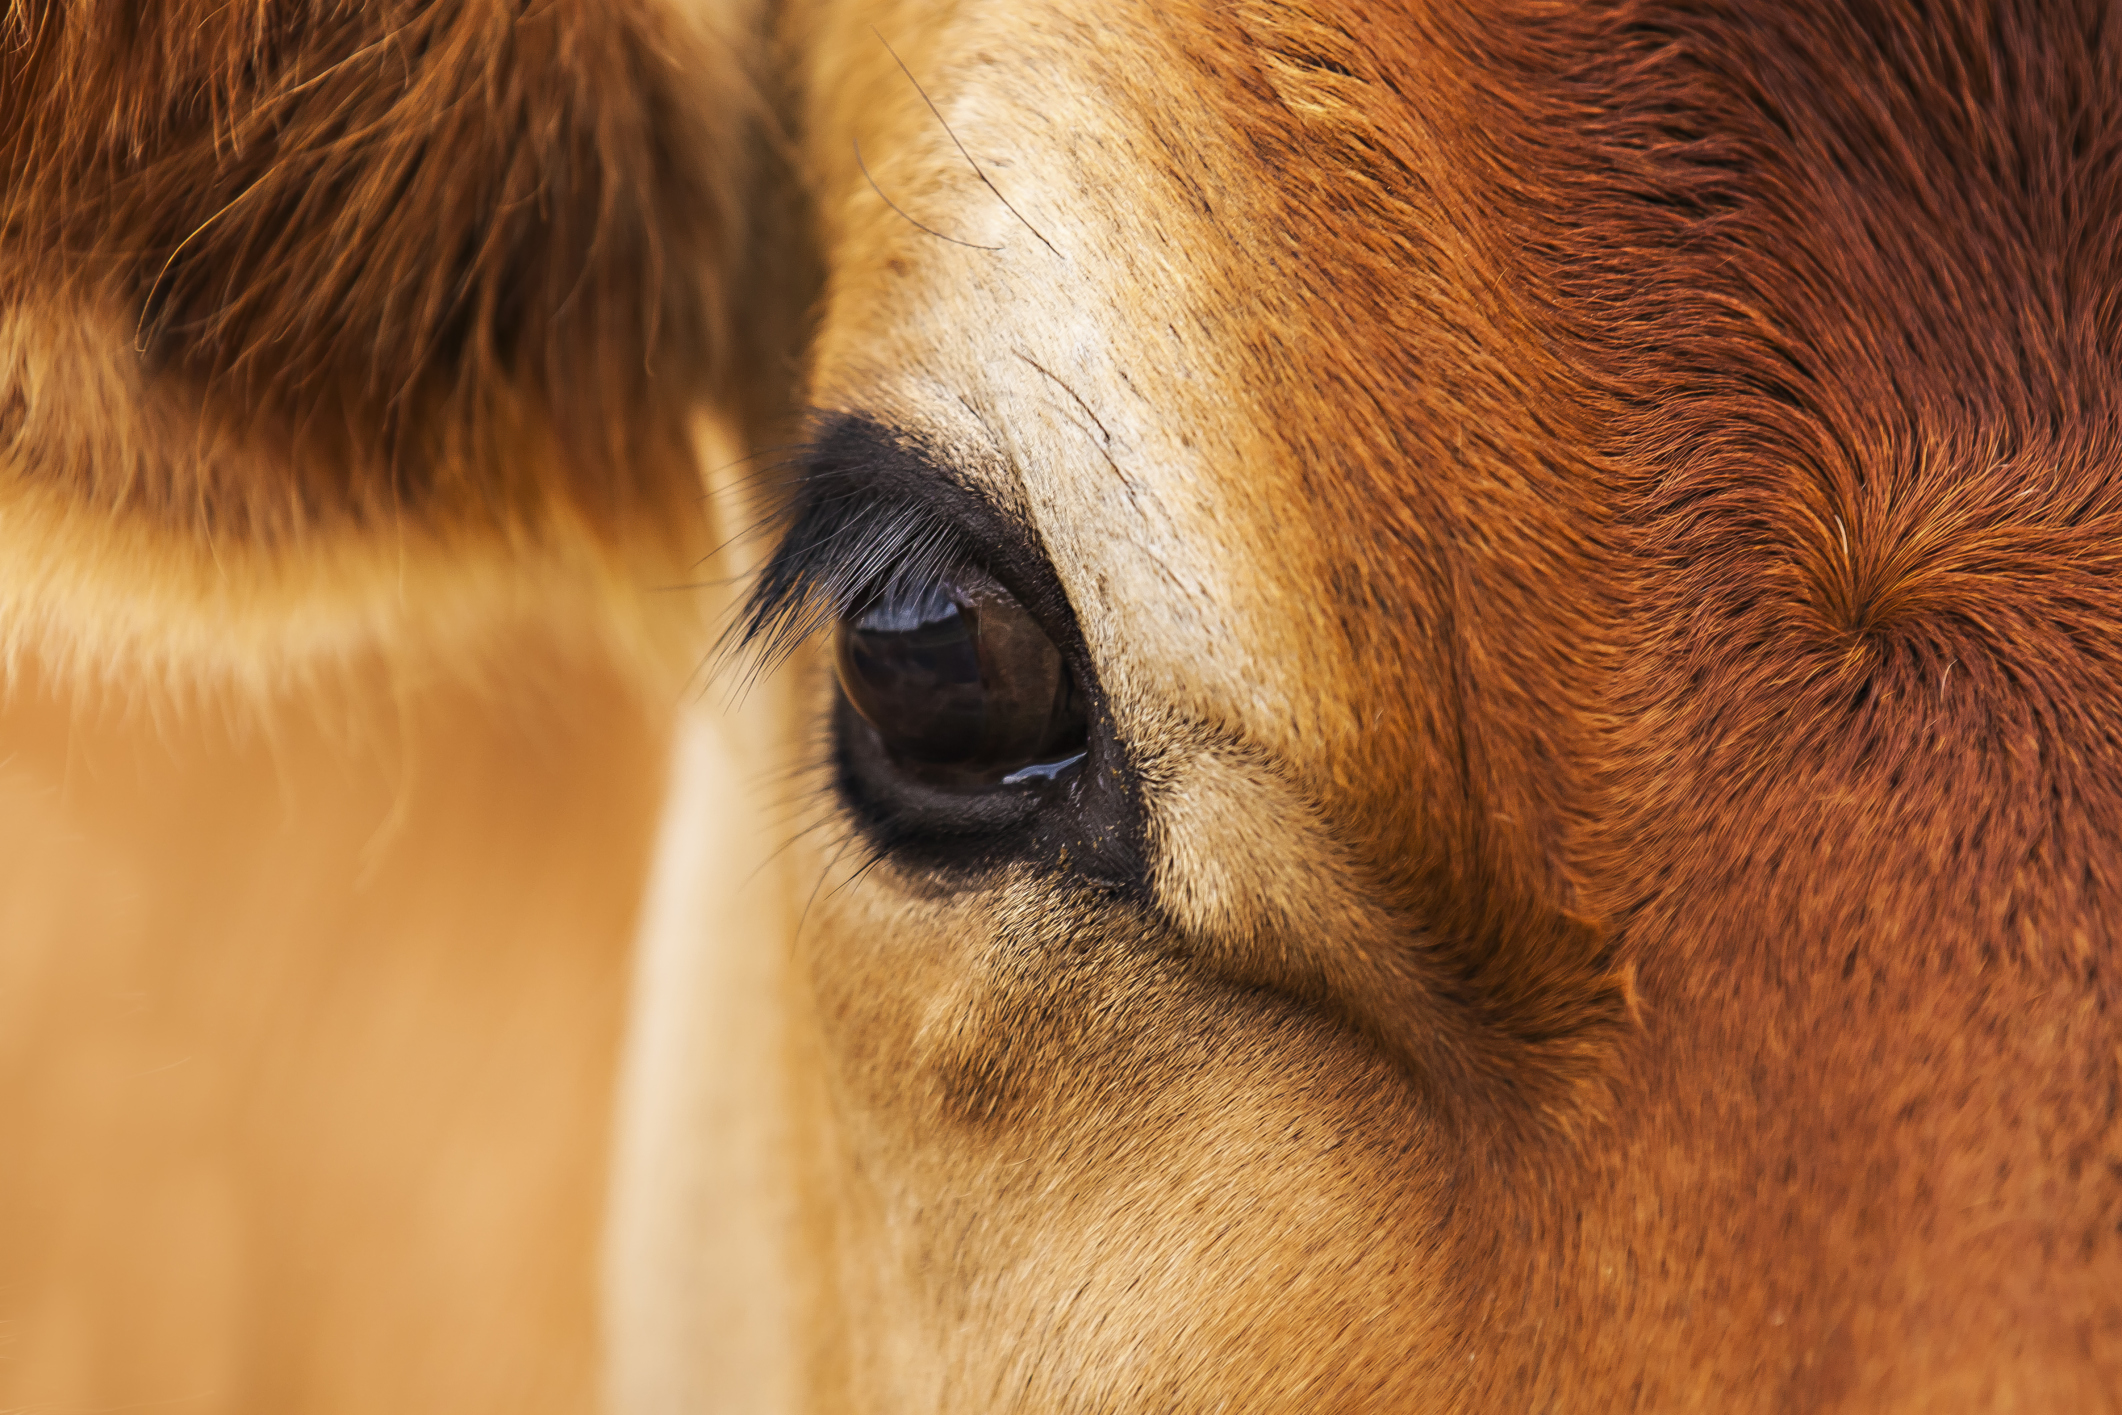 Taking Stock of Livestock